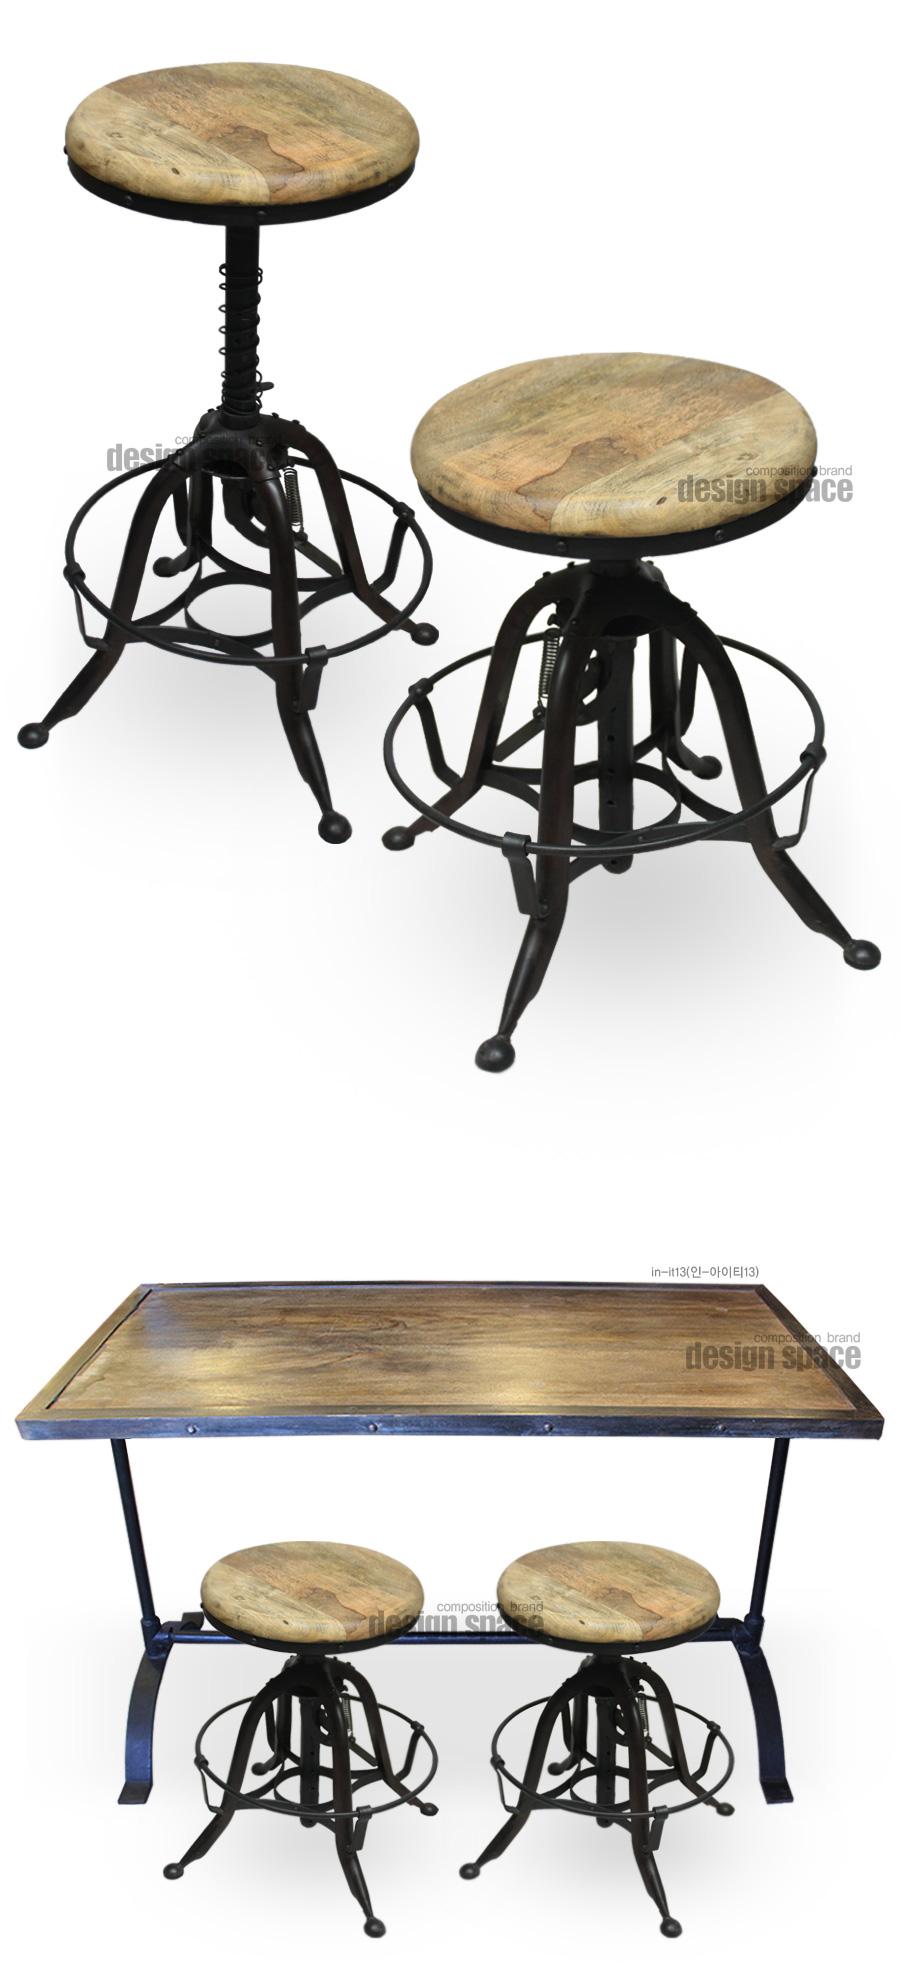 spring-stool_02.jpg